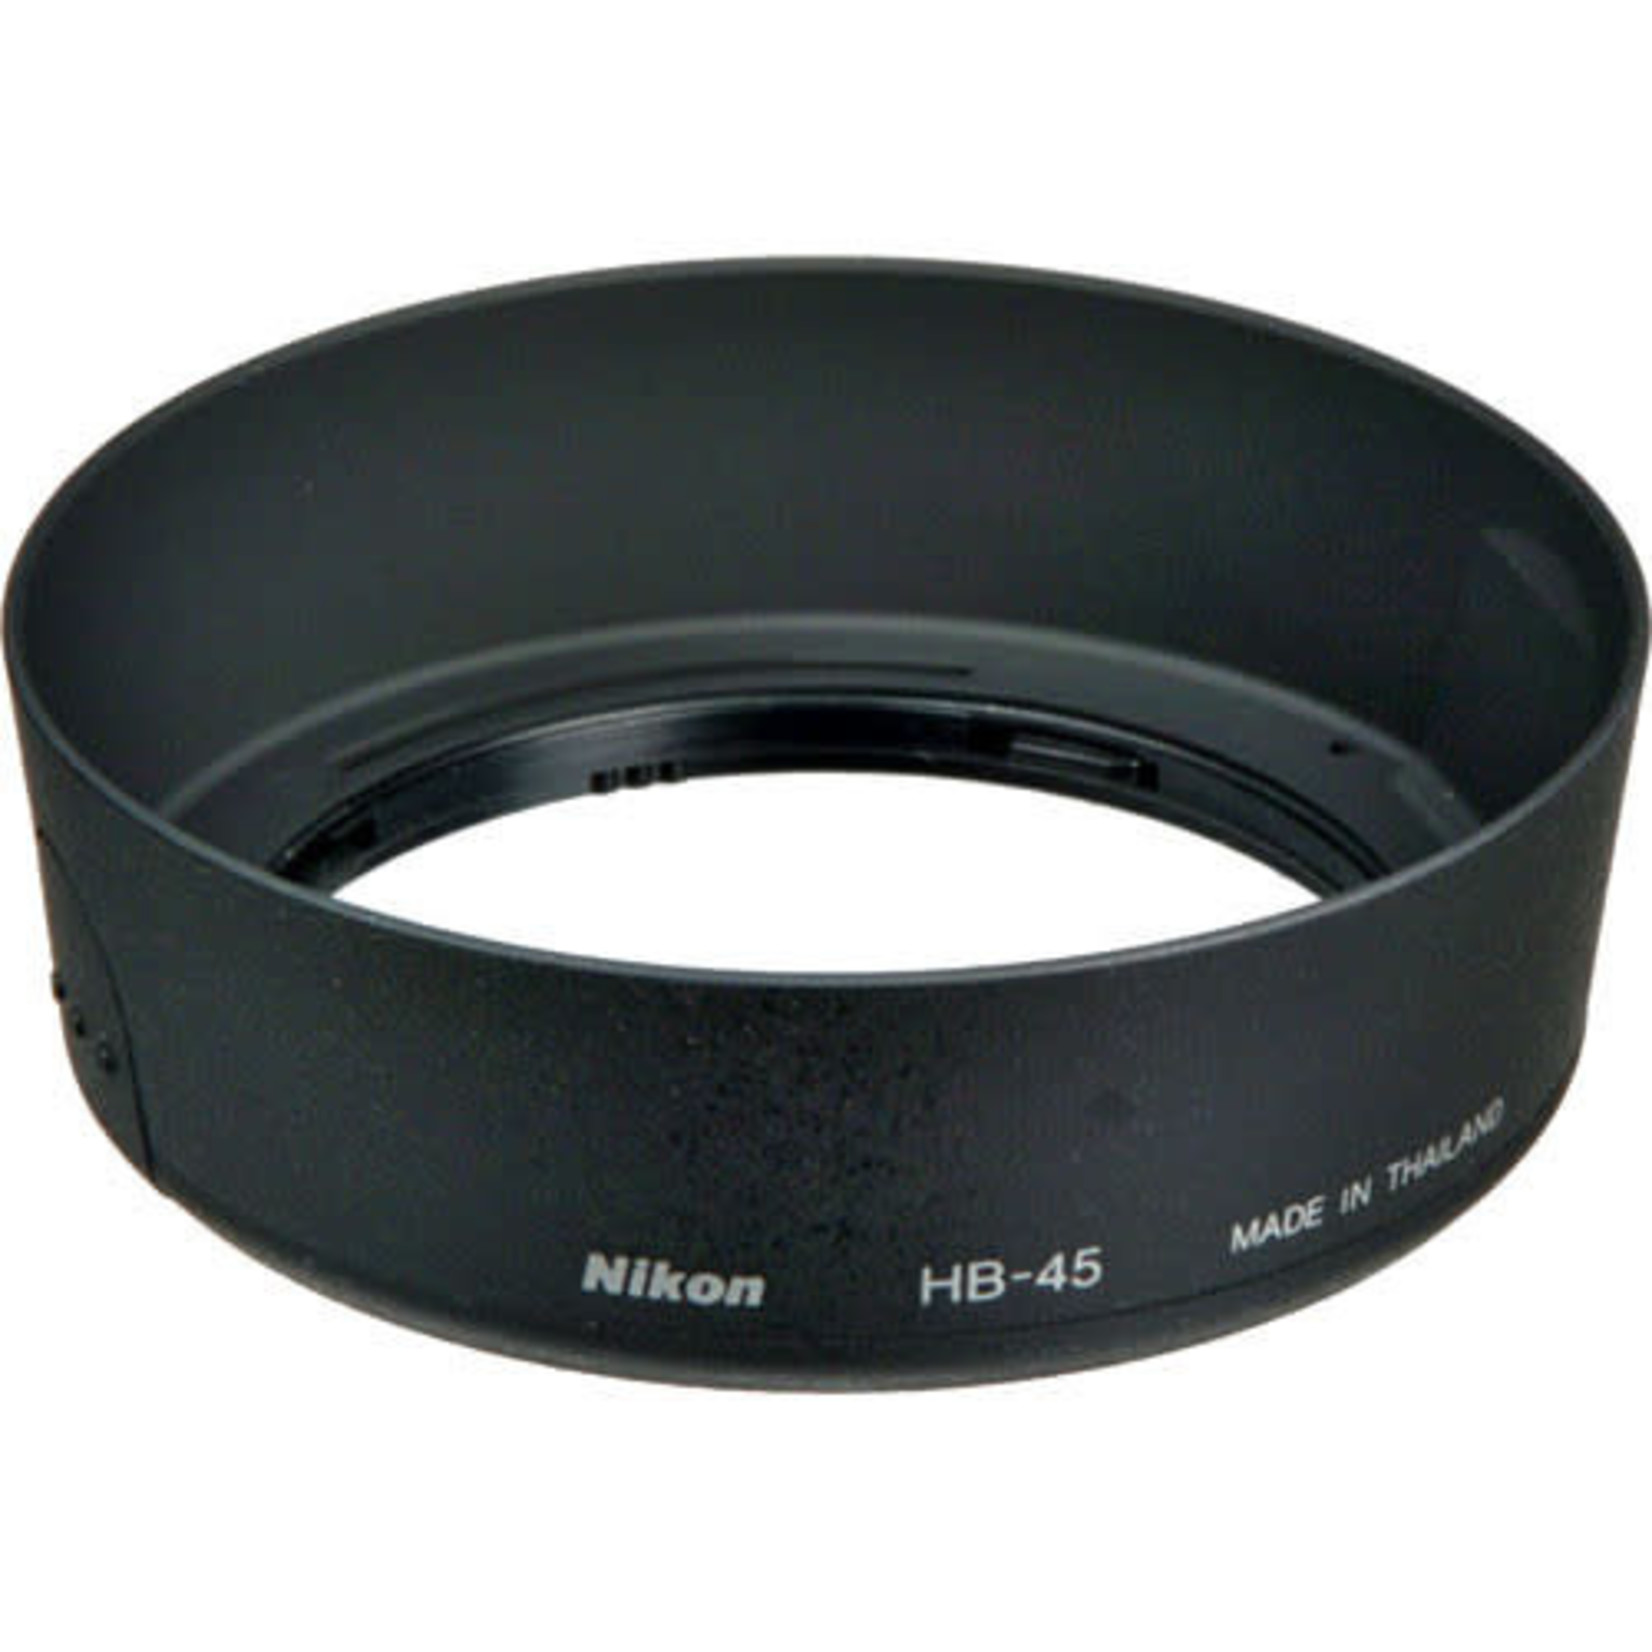 Nikon Nikon HB-45 Snap-On Lens Hood